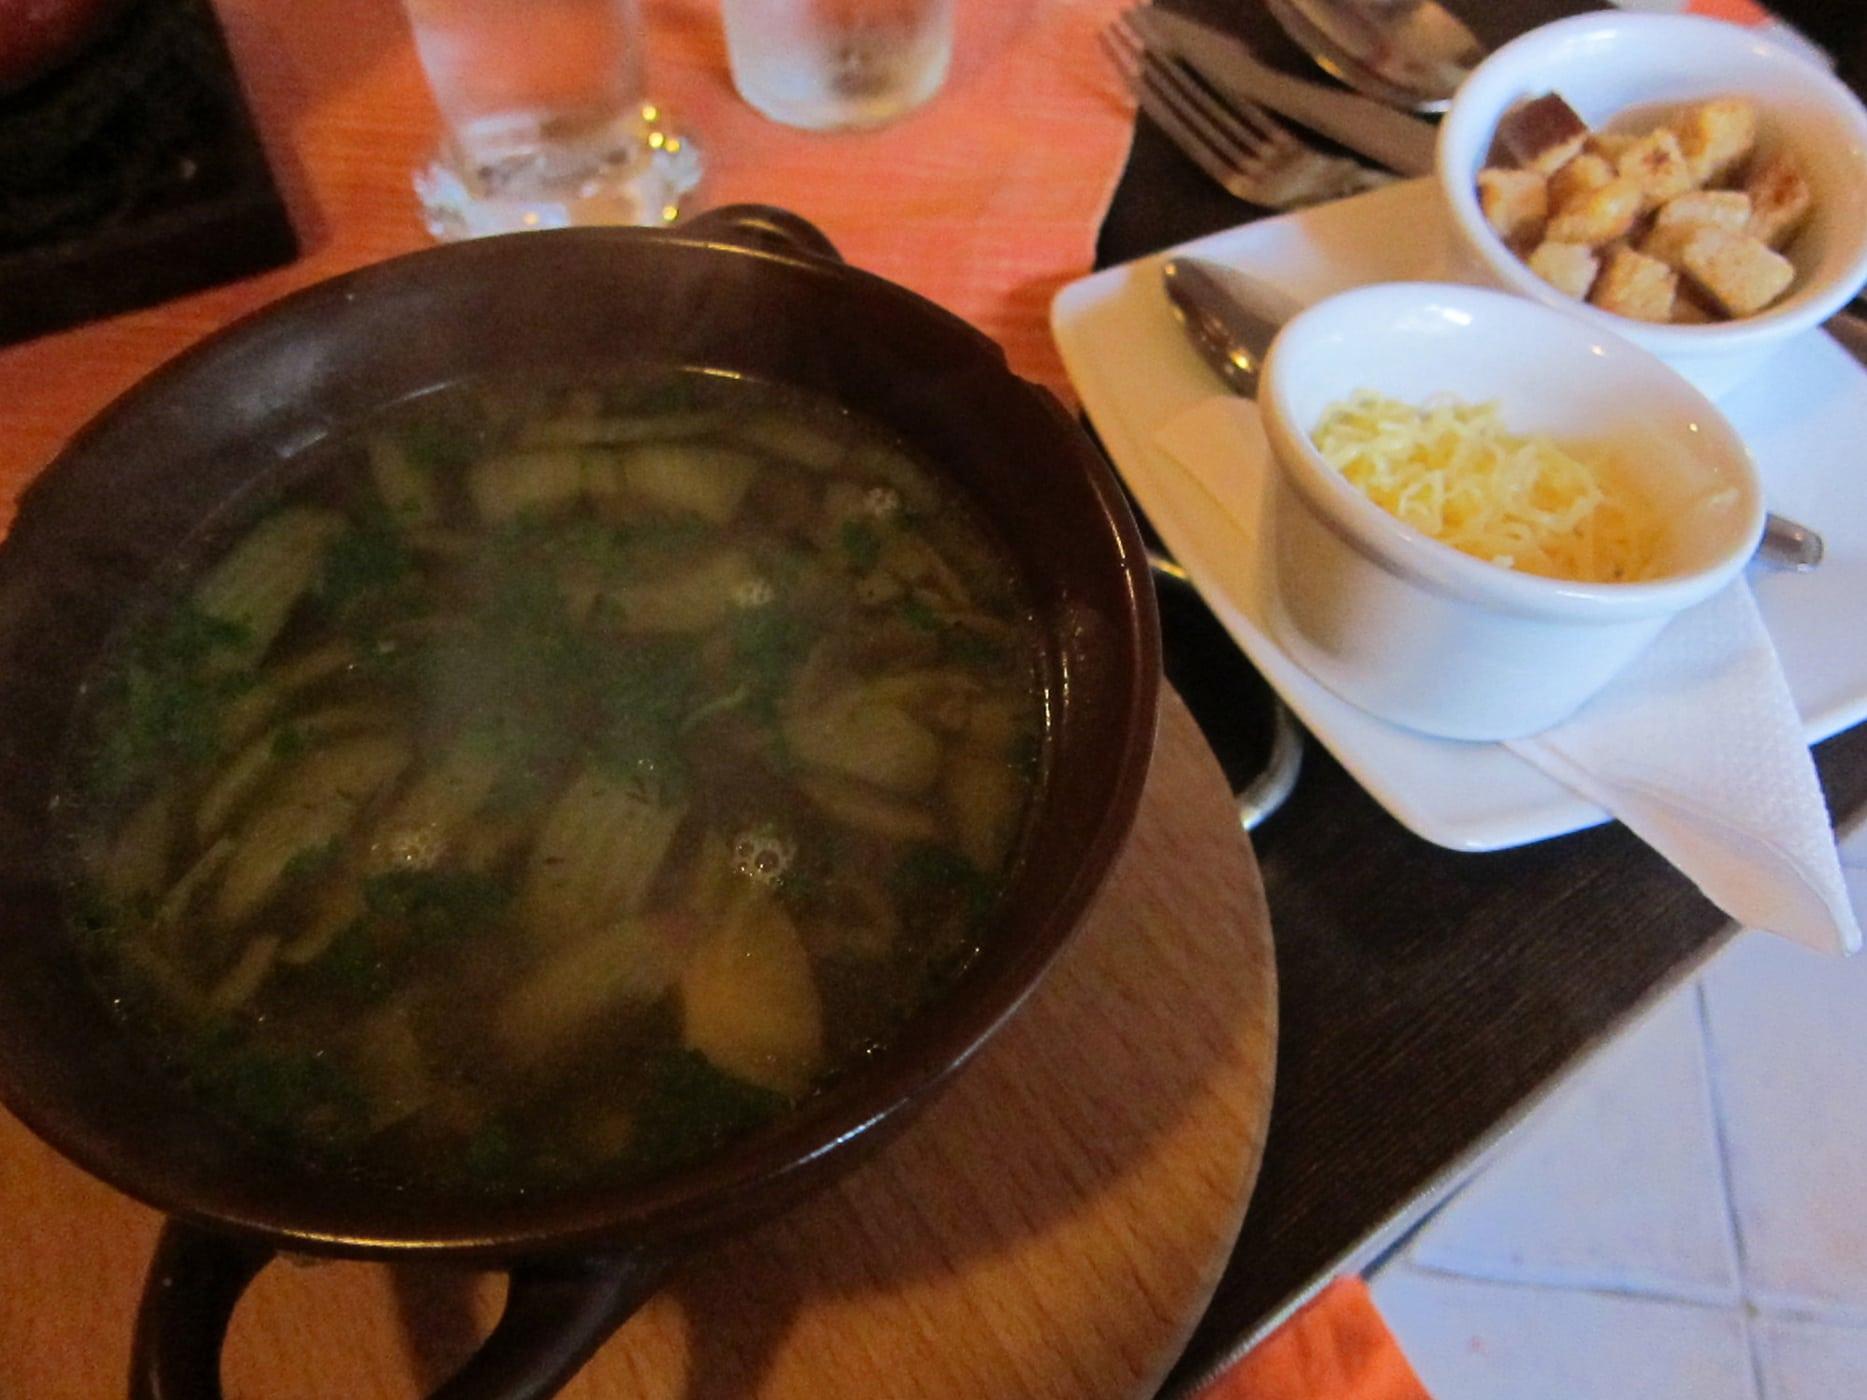 Onion soup in Krakow, Poland.